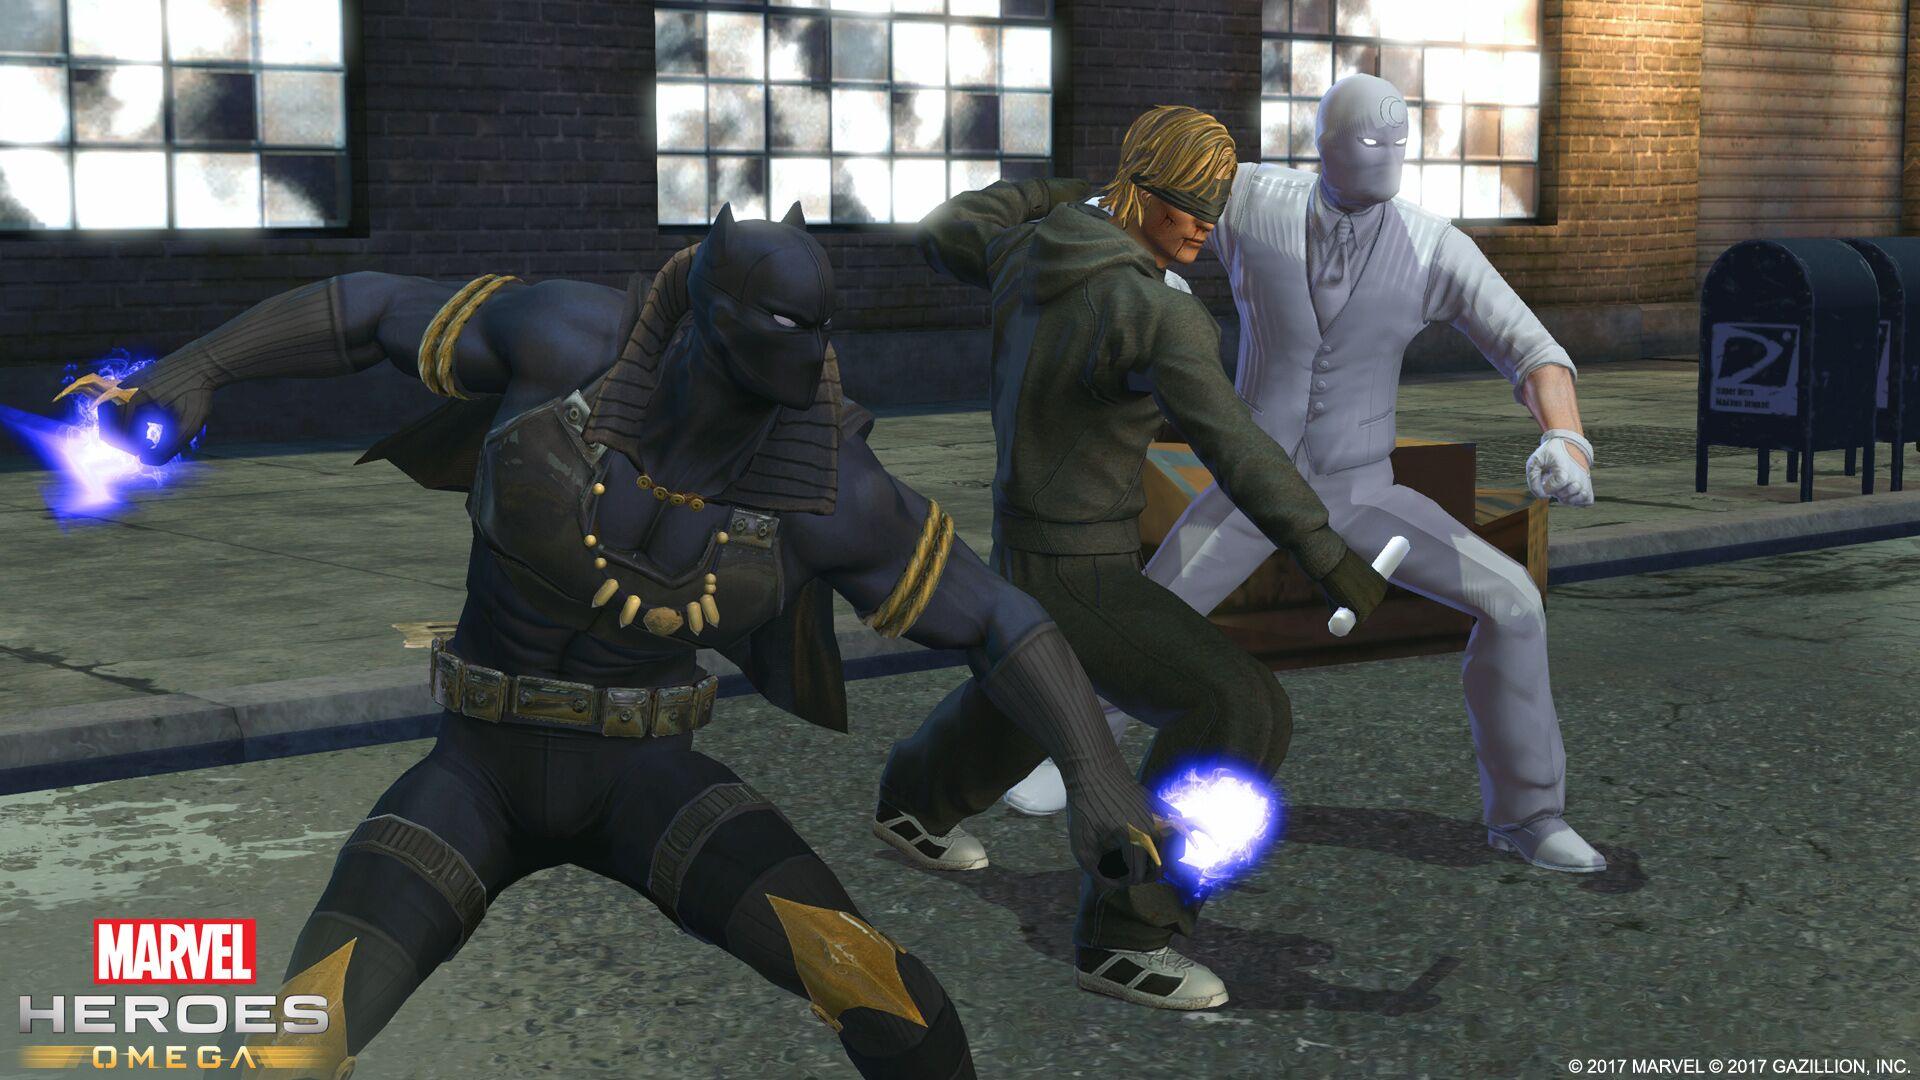 Imágenes de Marvel Heroes Omega - MeriStation